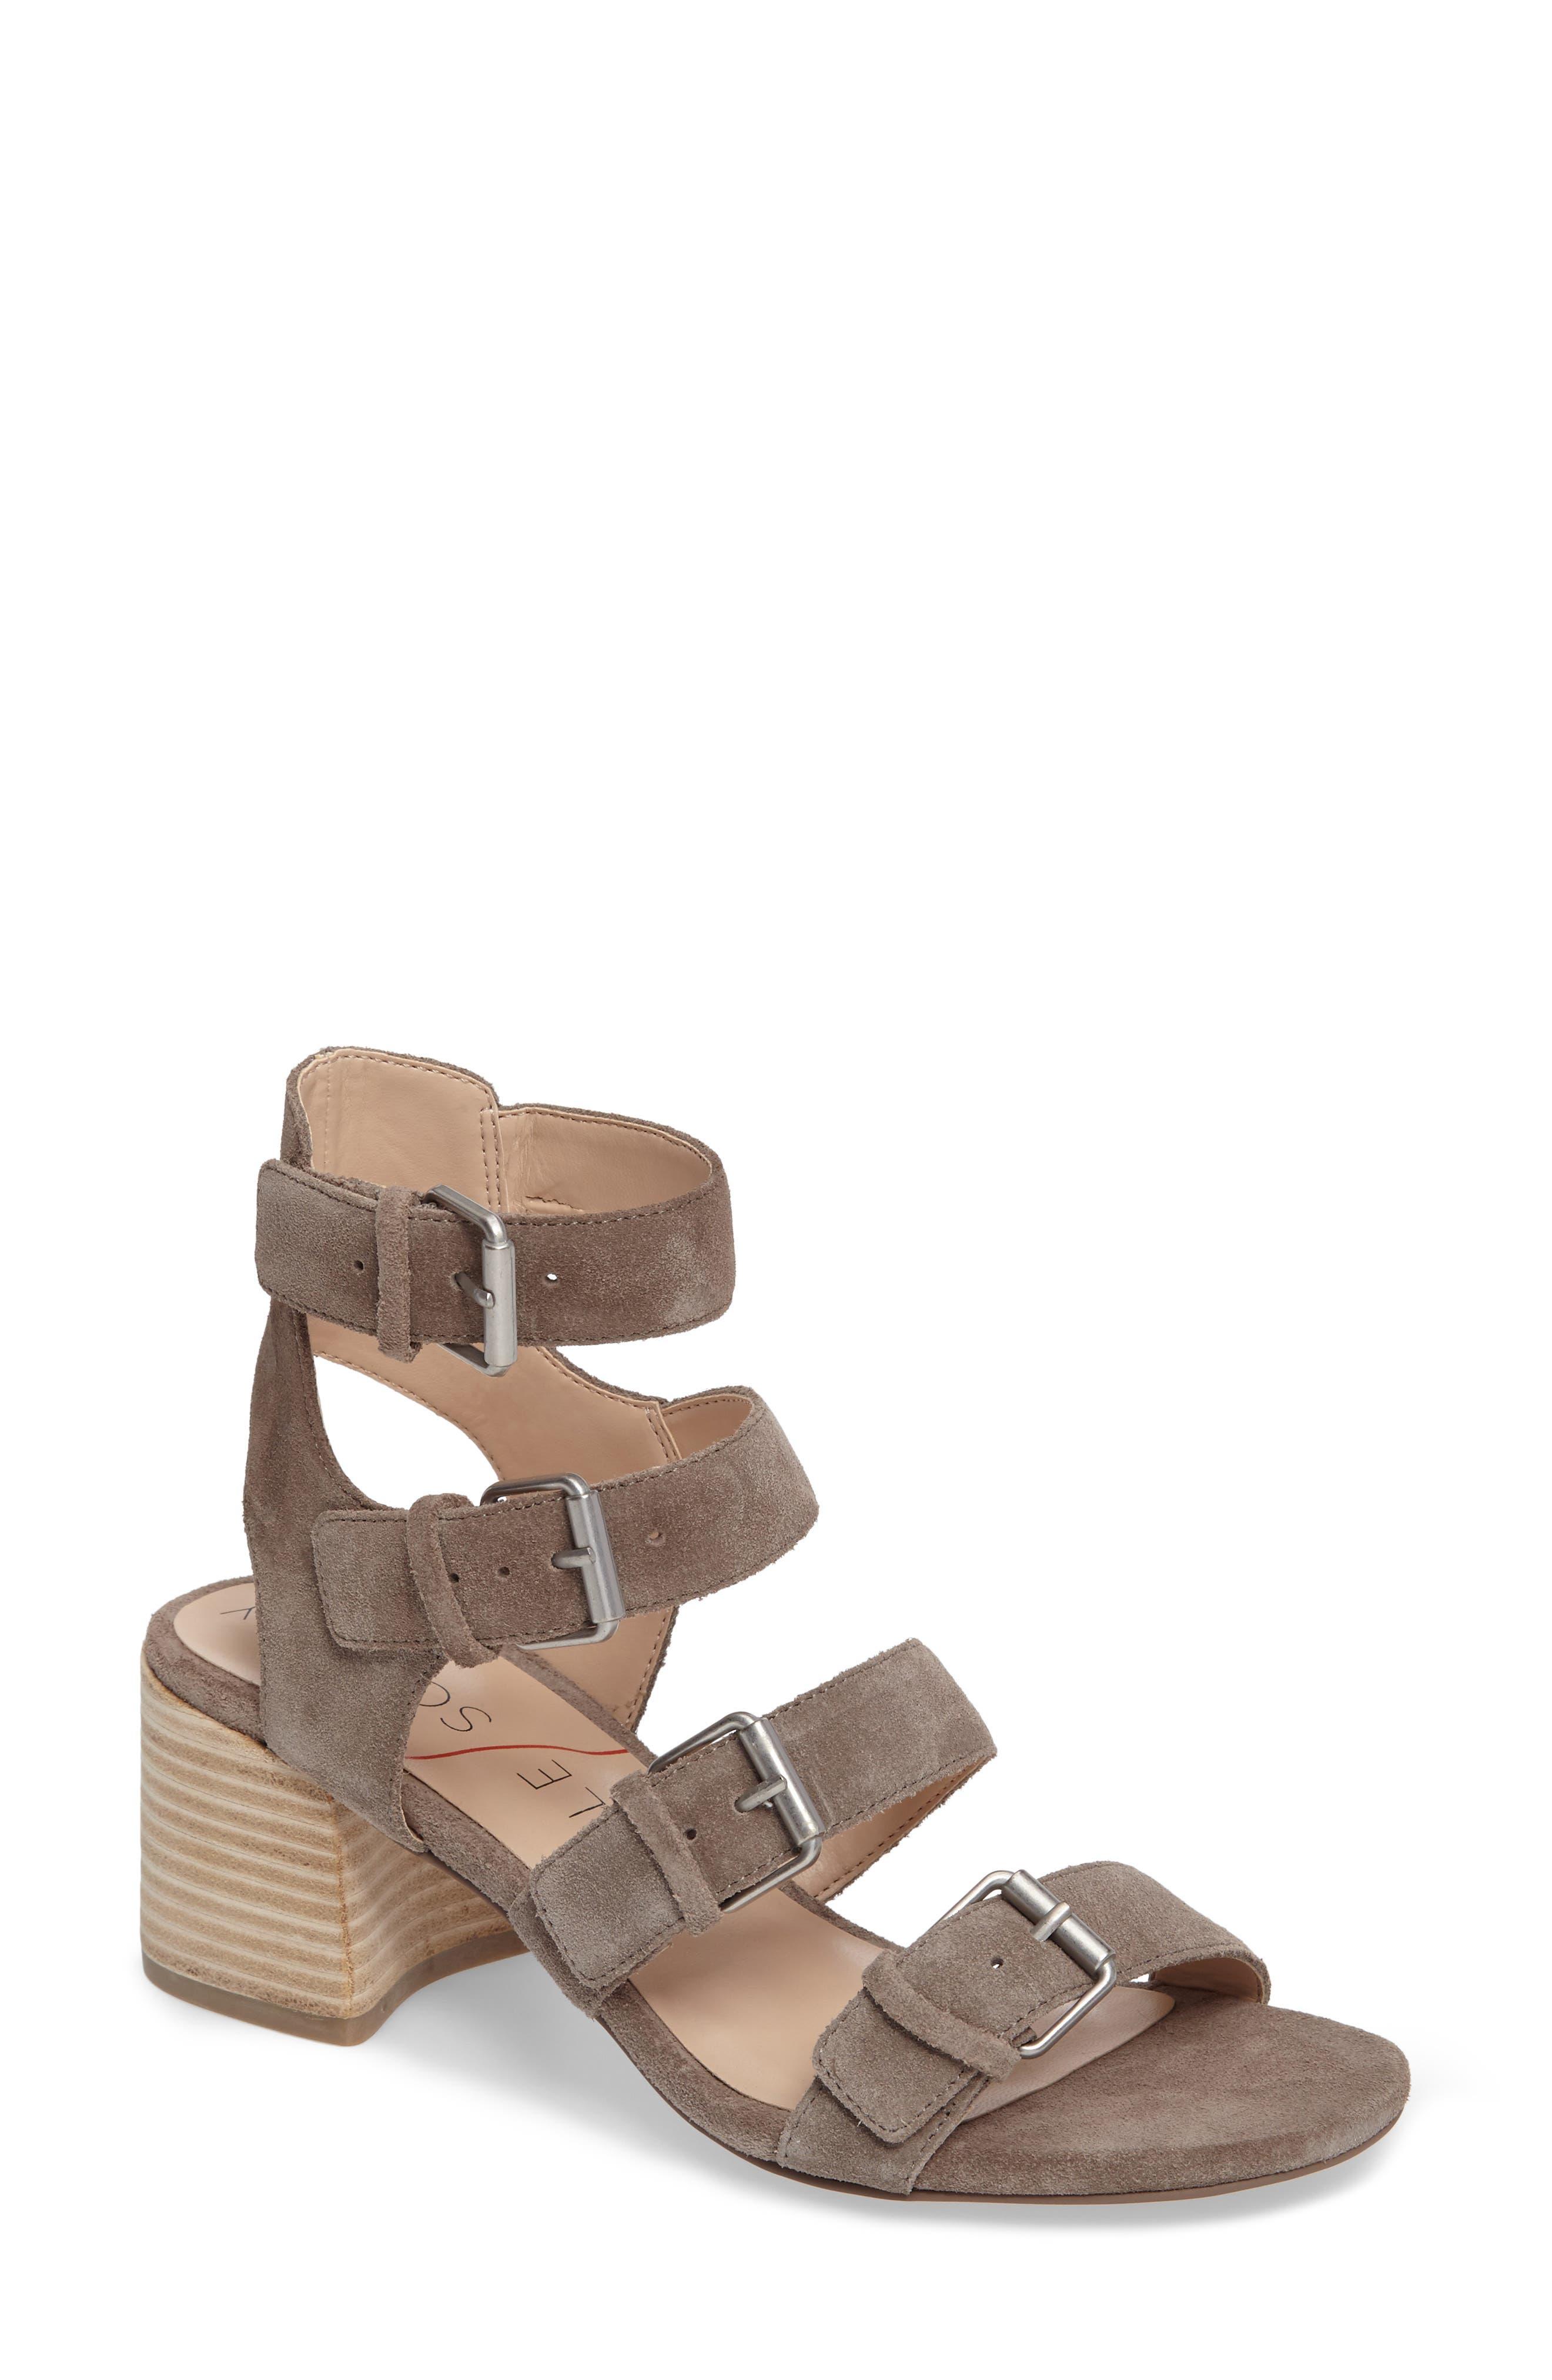 Culver Block Heel Sandal,                         Main,                         color, MUSHROOM SUEDE